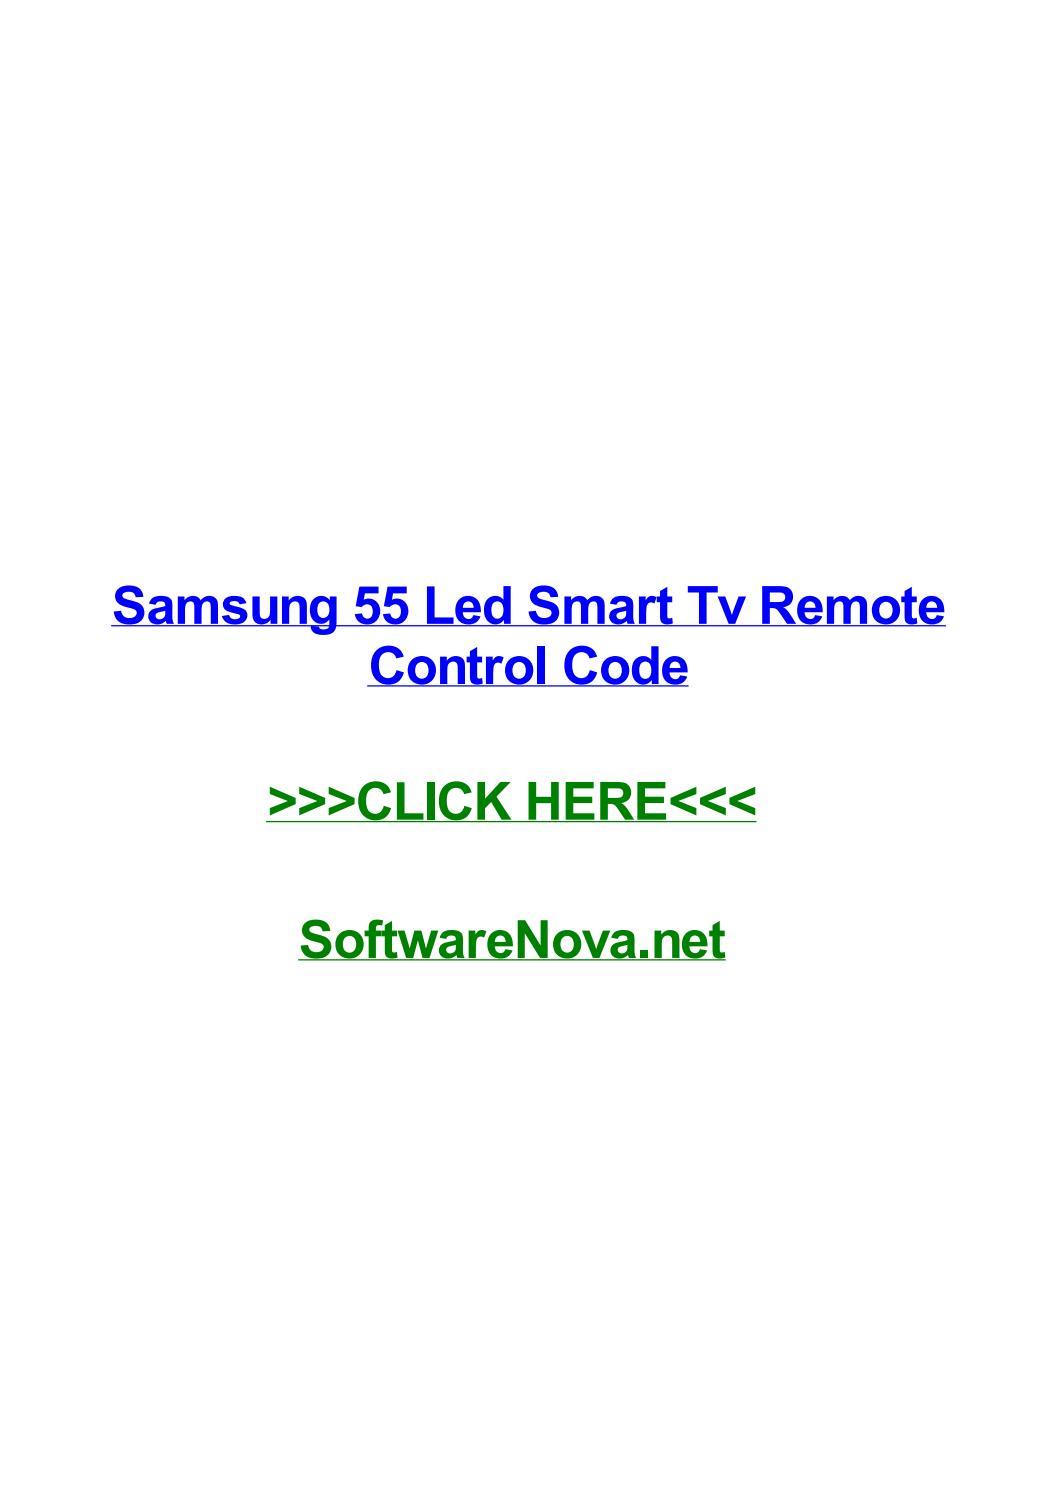 Samsung Smart Tv Remote Codes